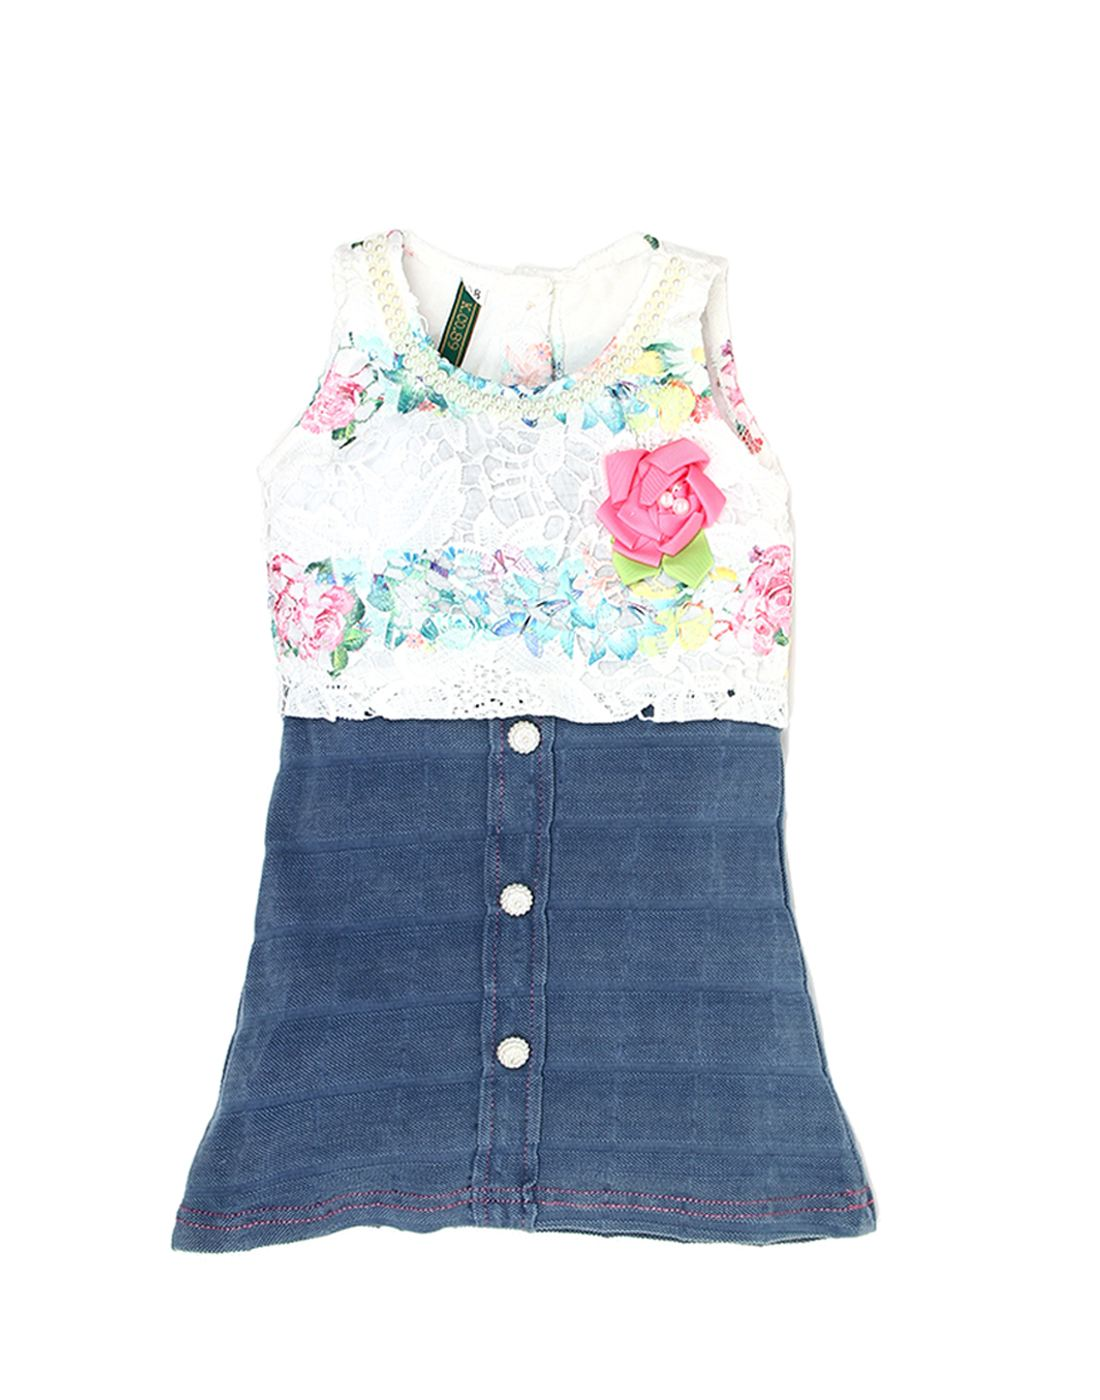 K.C.O 89 Girls Casual Solid Sleeveless Dress